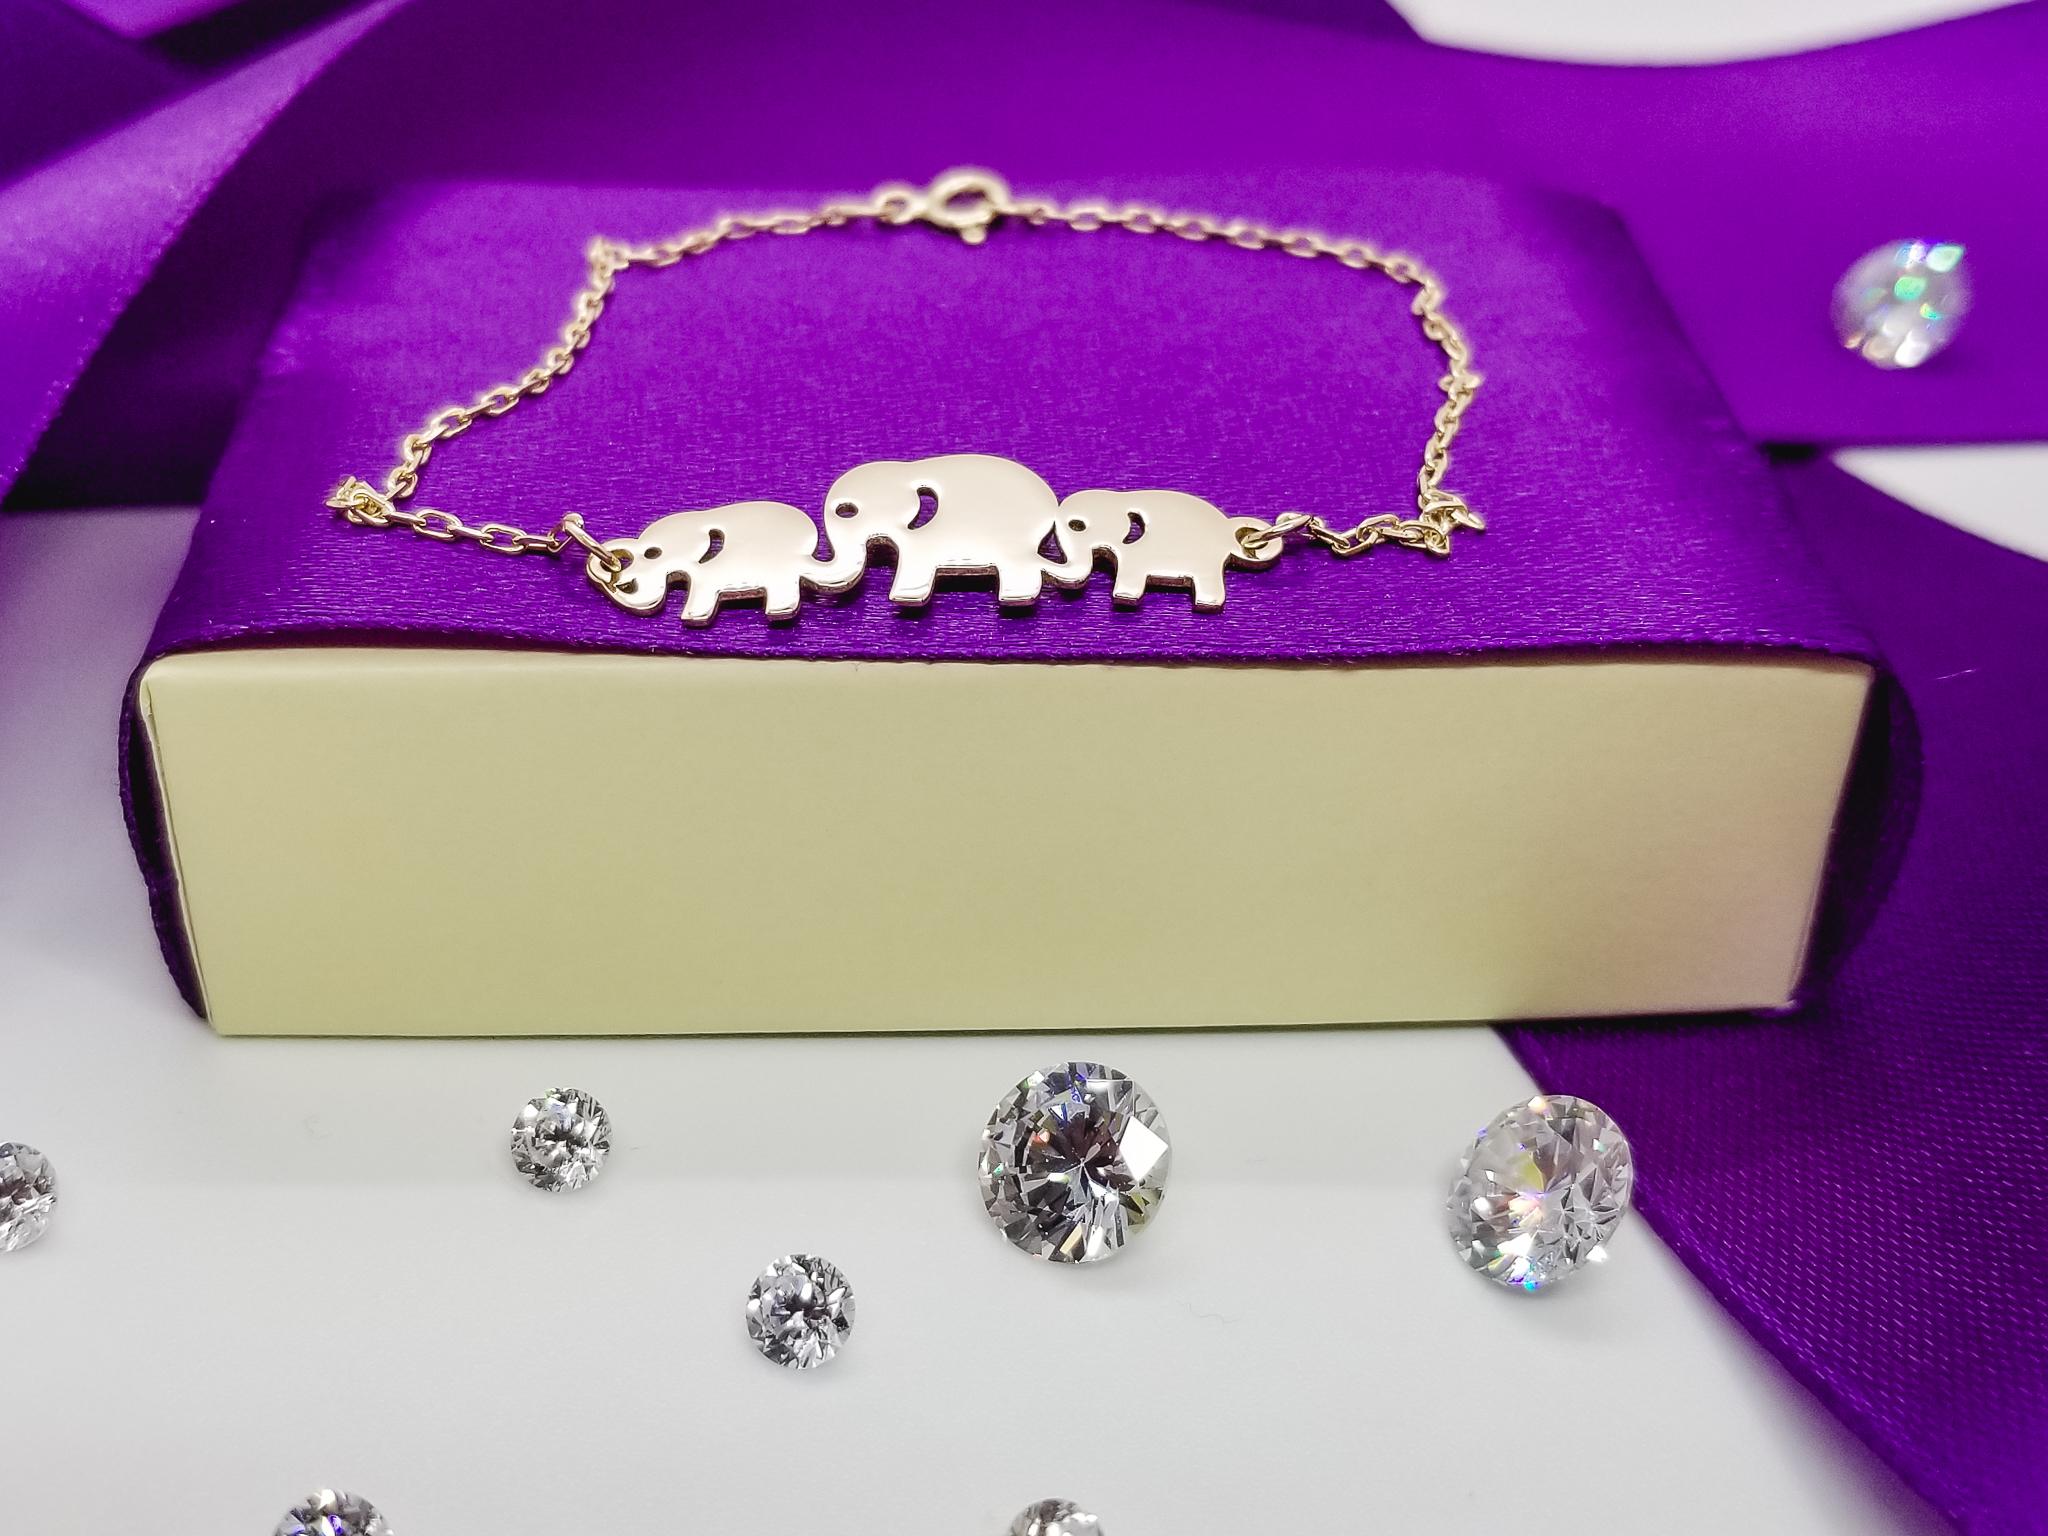 Bratara FATI 27 din aur galben de 14K cu lant si medalion 3 elefanti